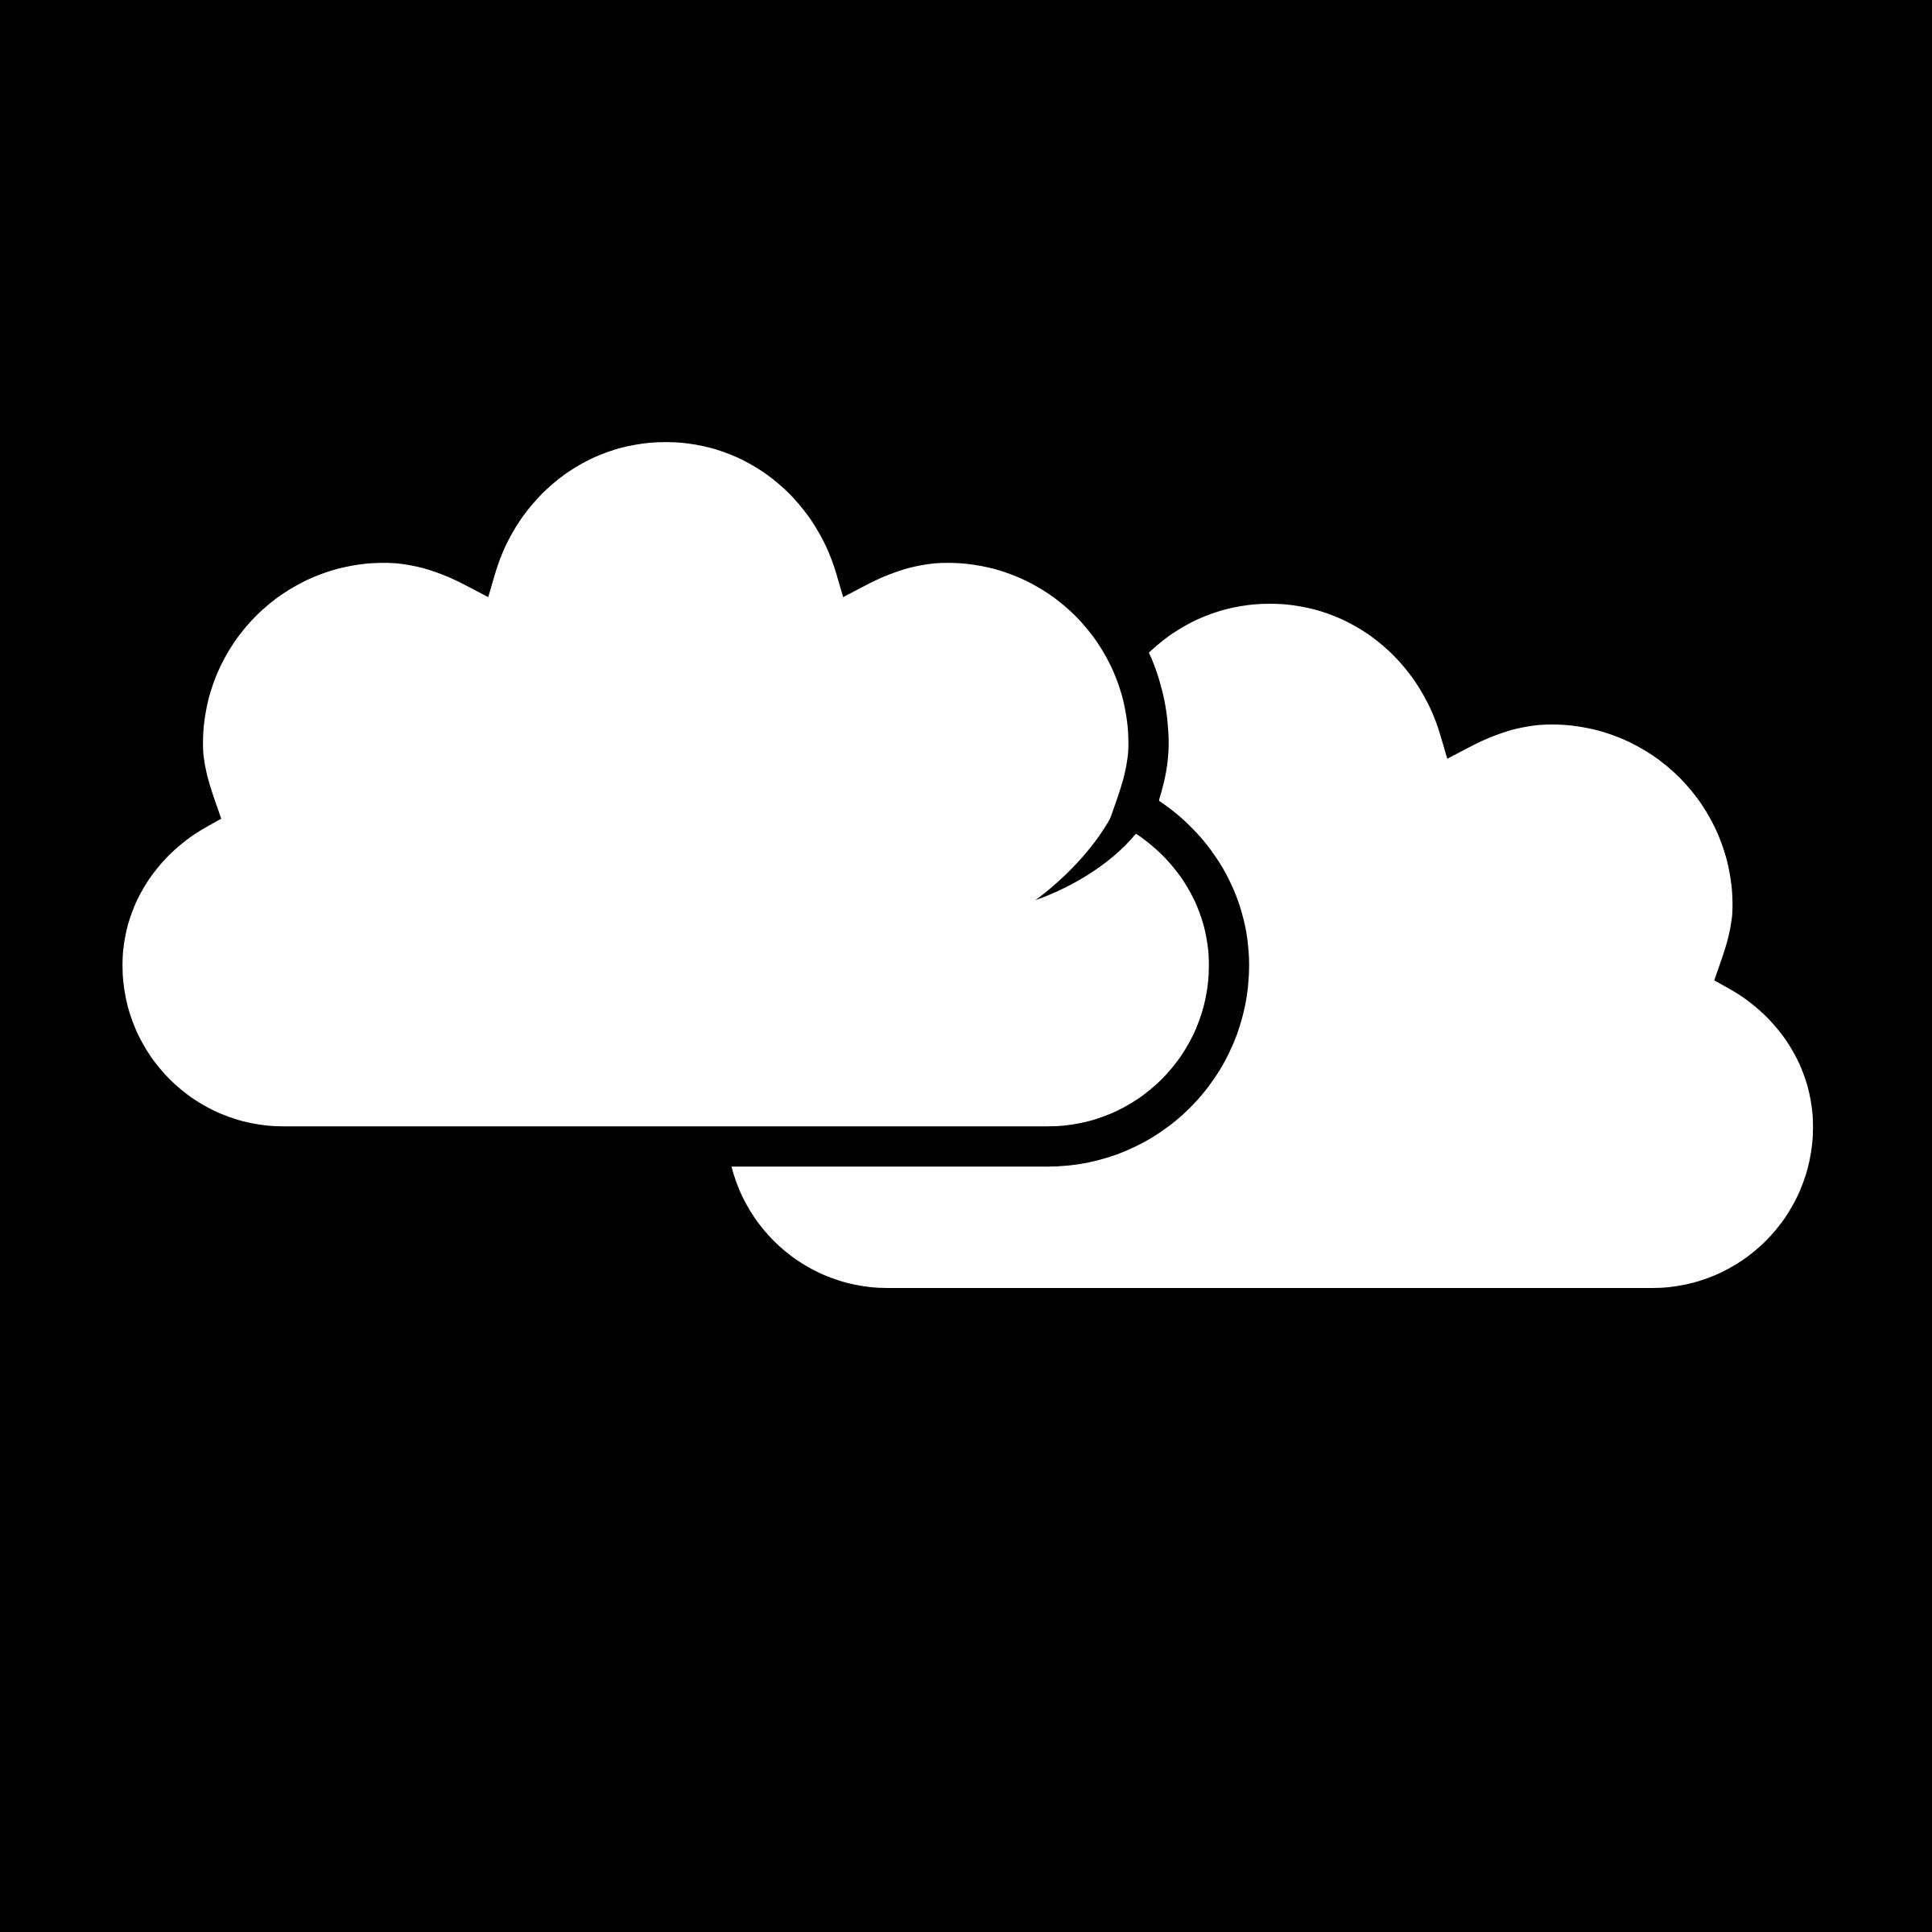 white sunny clouds clipart rh worldartsme com clip art clouds black and white clip art clouds of glory